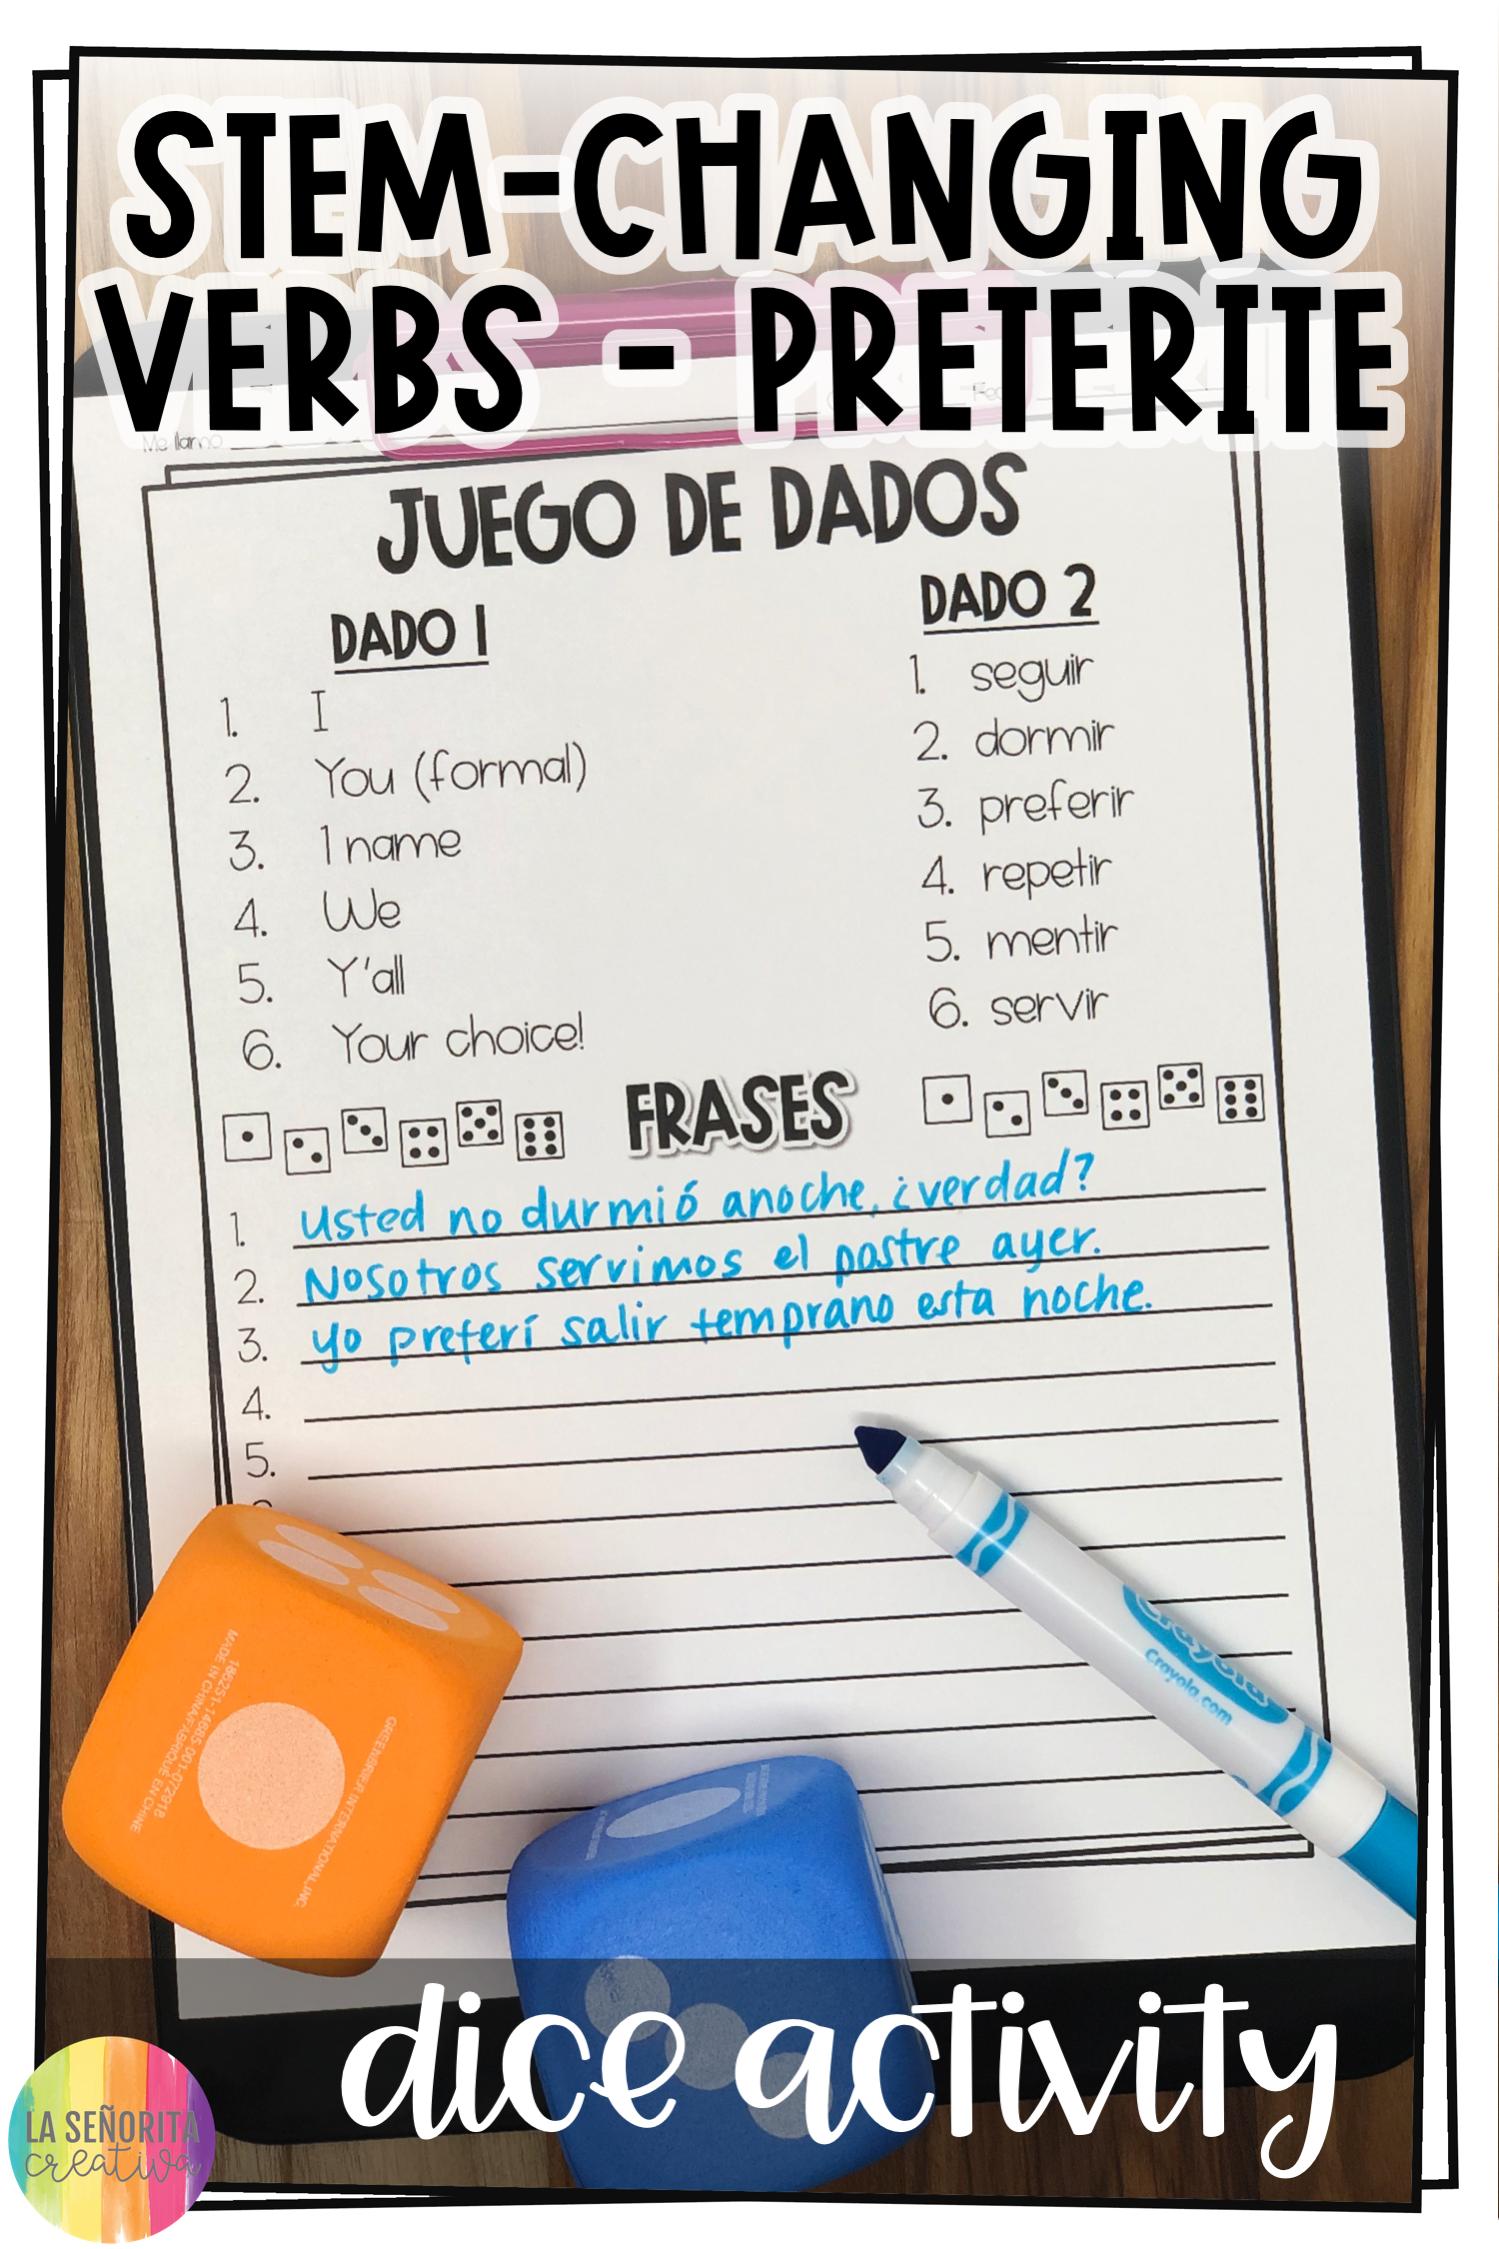 Stem Changing Verbs Preterite Conjugation Dice Activity